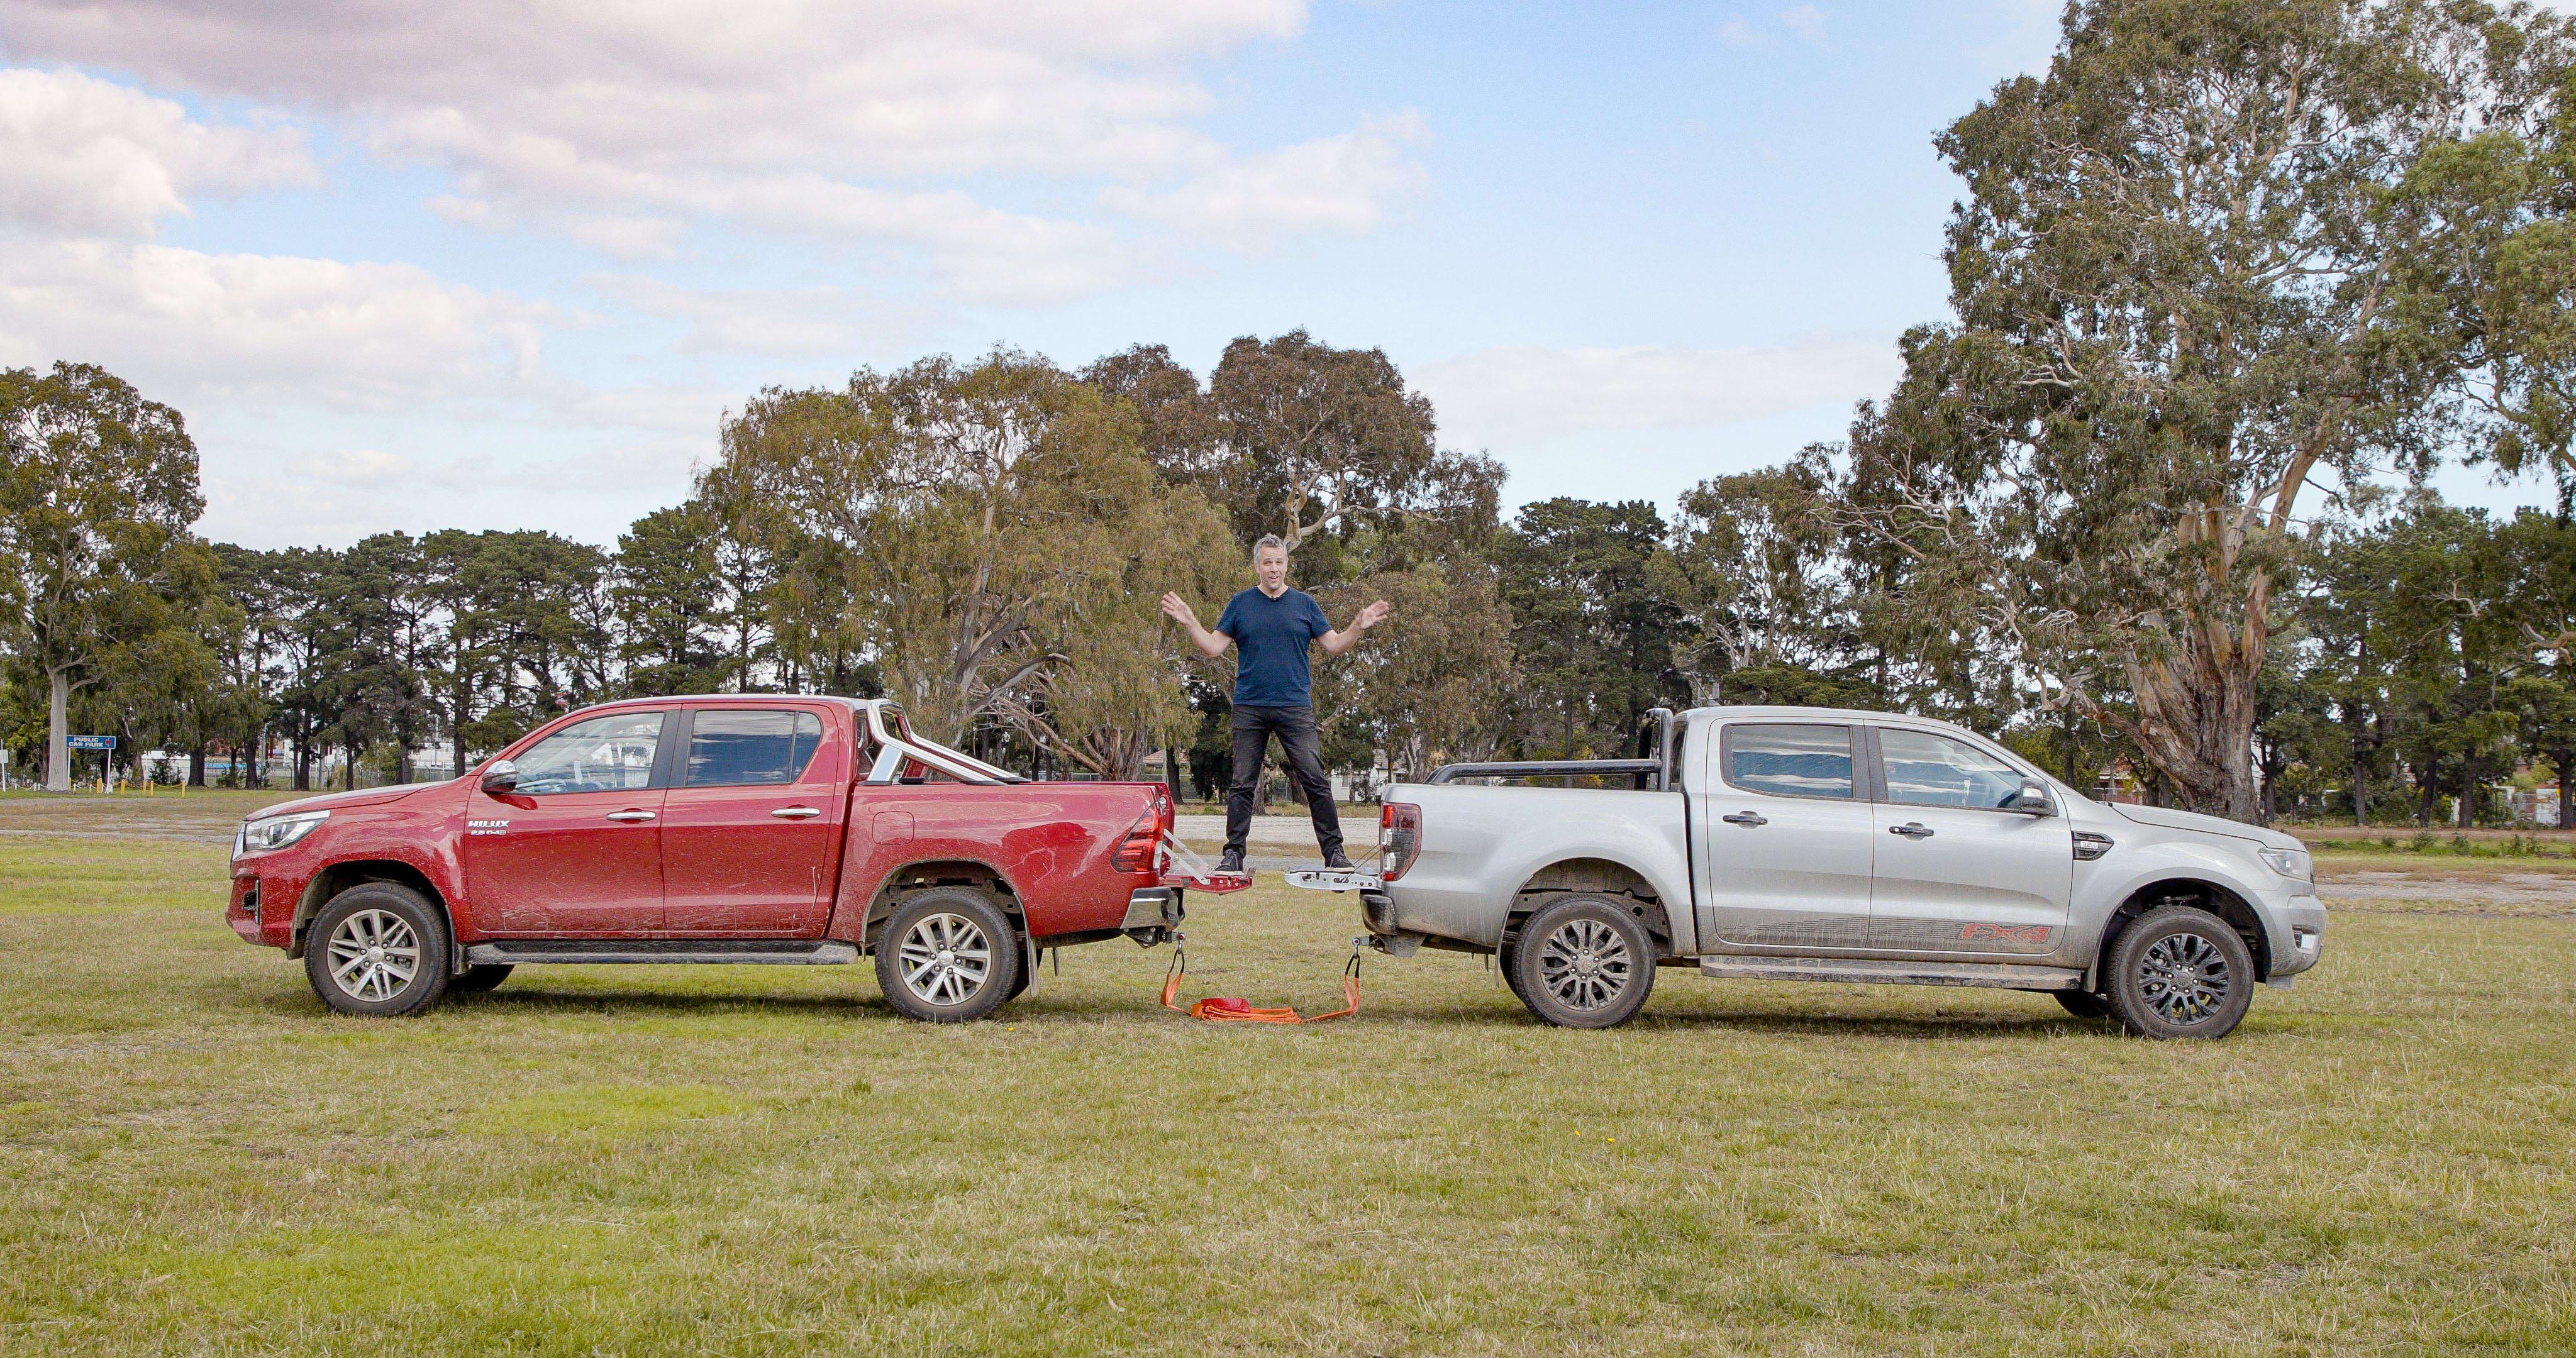 Kelebihan Kekurangan Toyota Ranger Murah Berkualitas